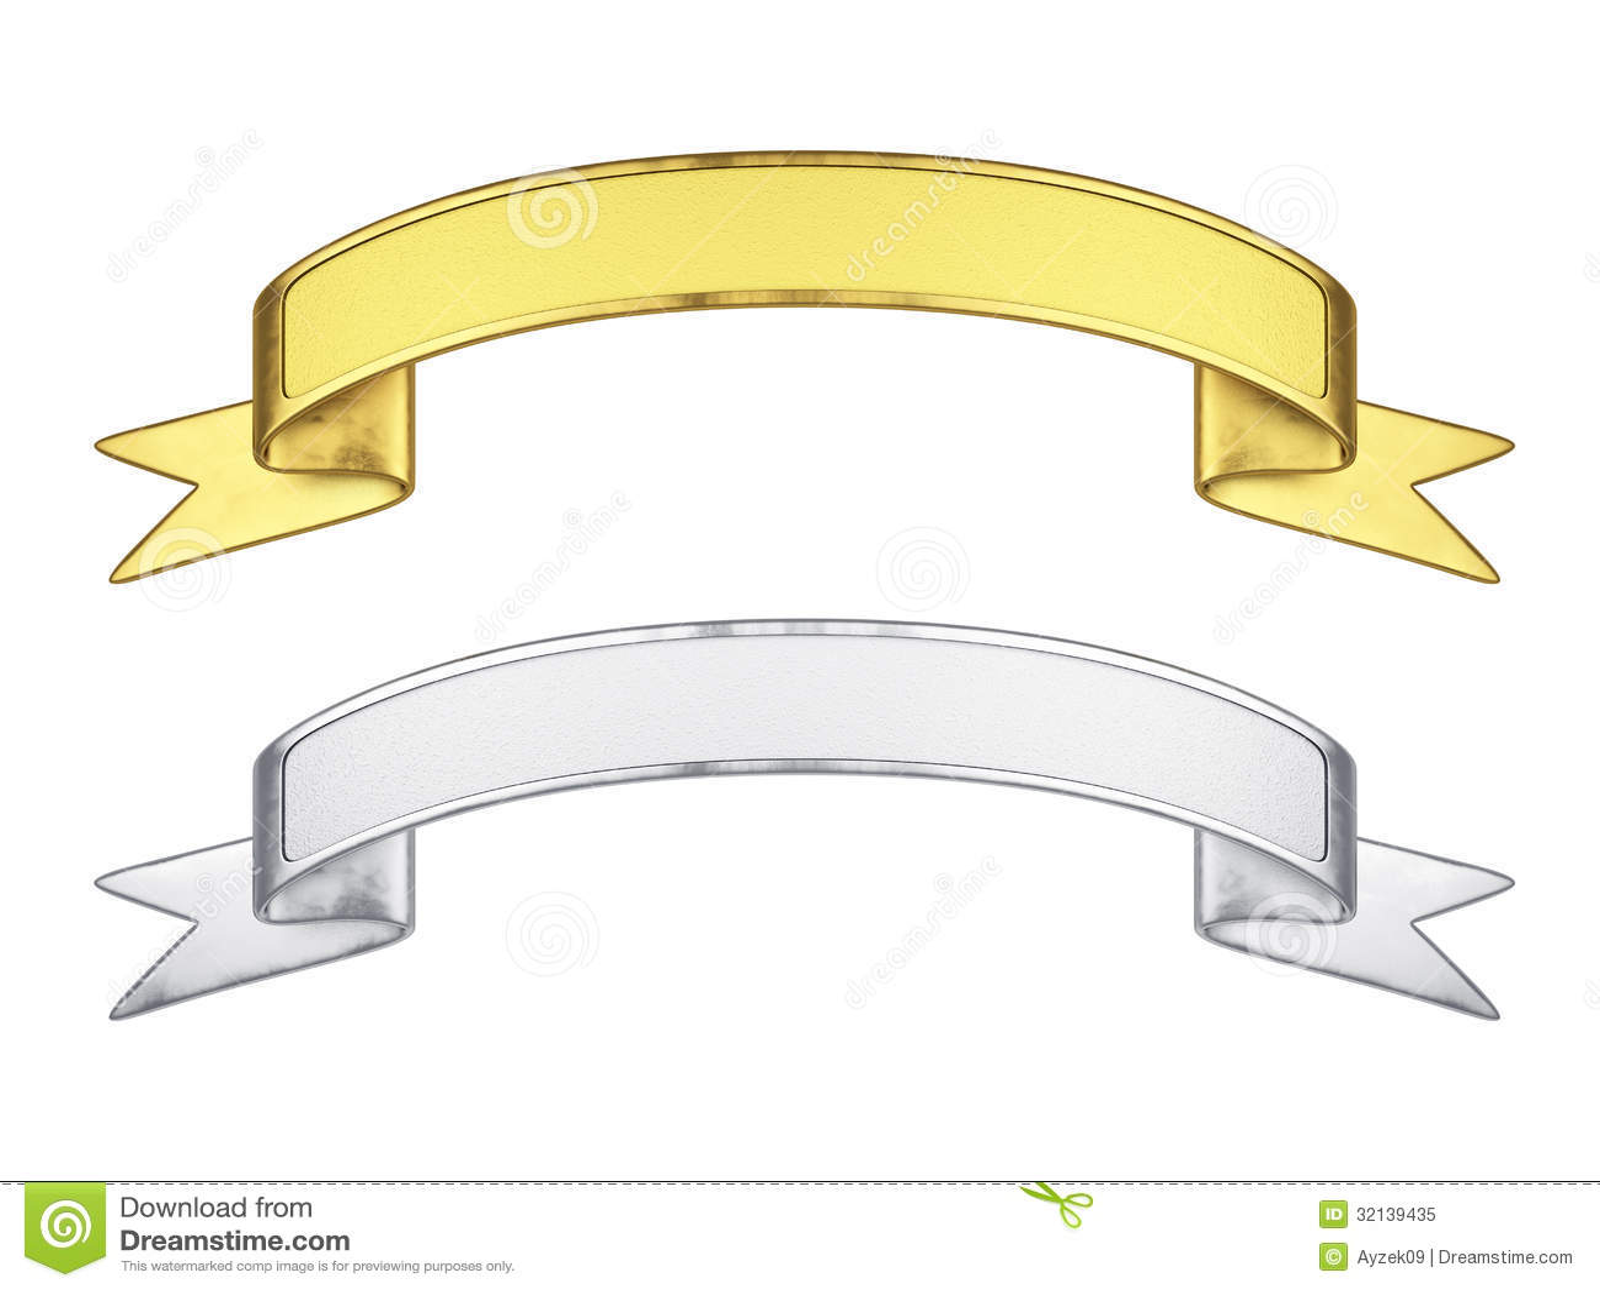 Ribbon Set Royalty Free Stock Photo - Image: 32139435